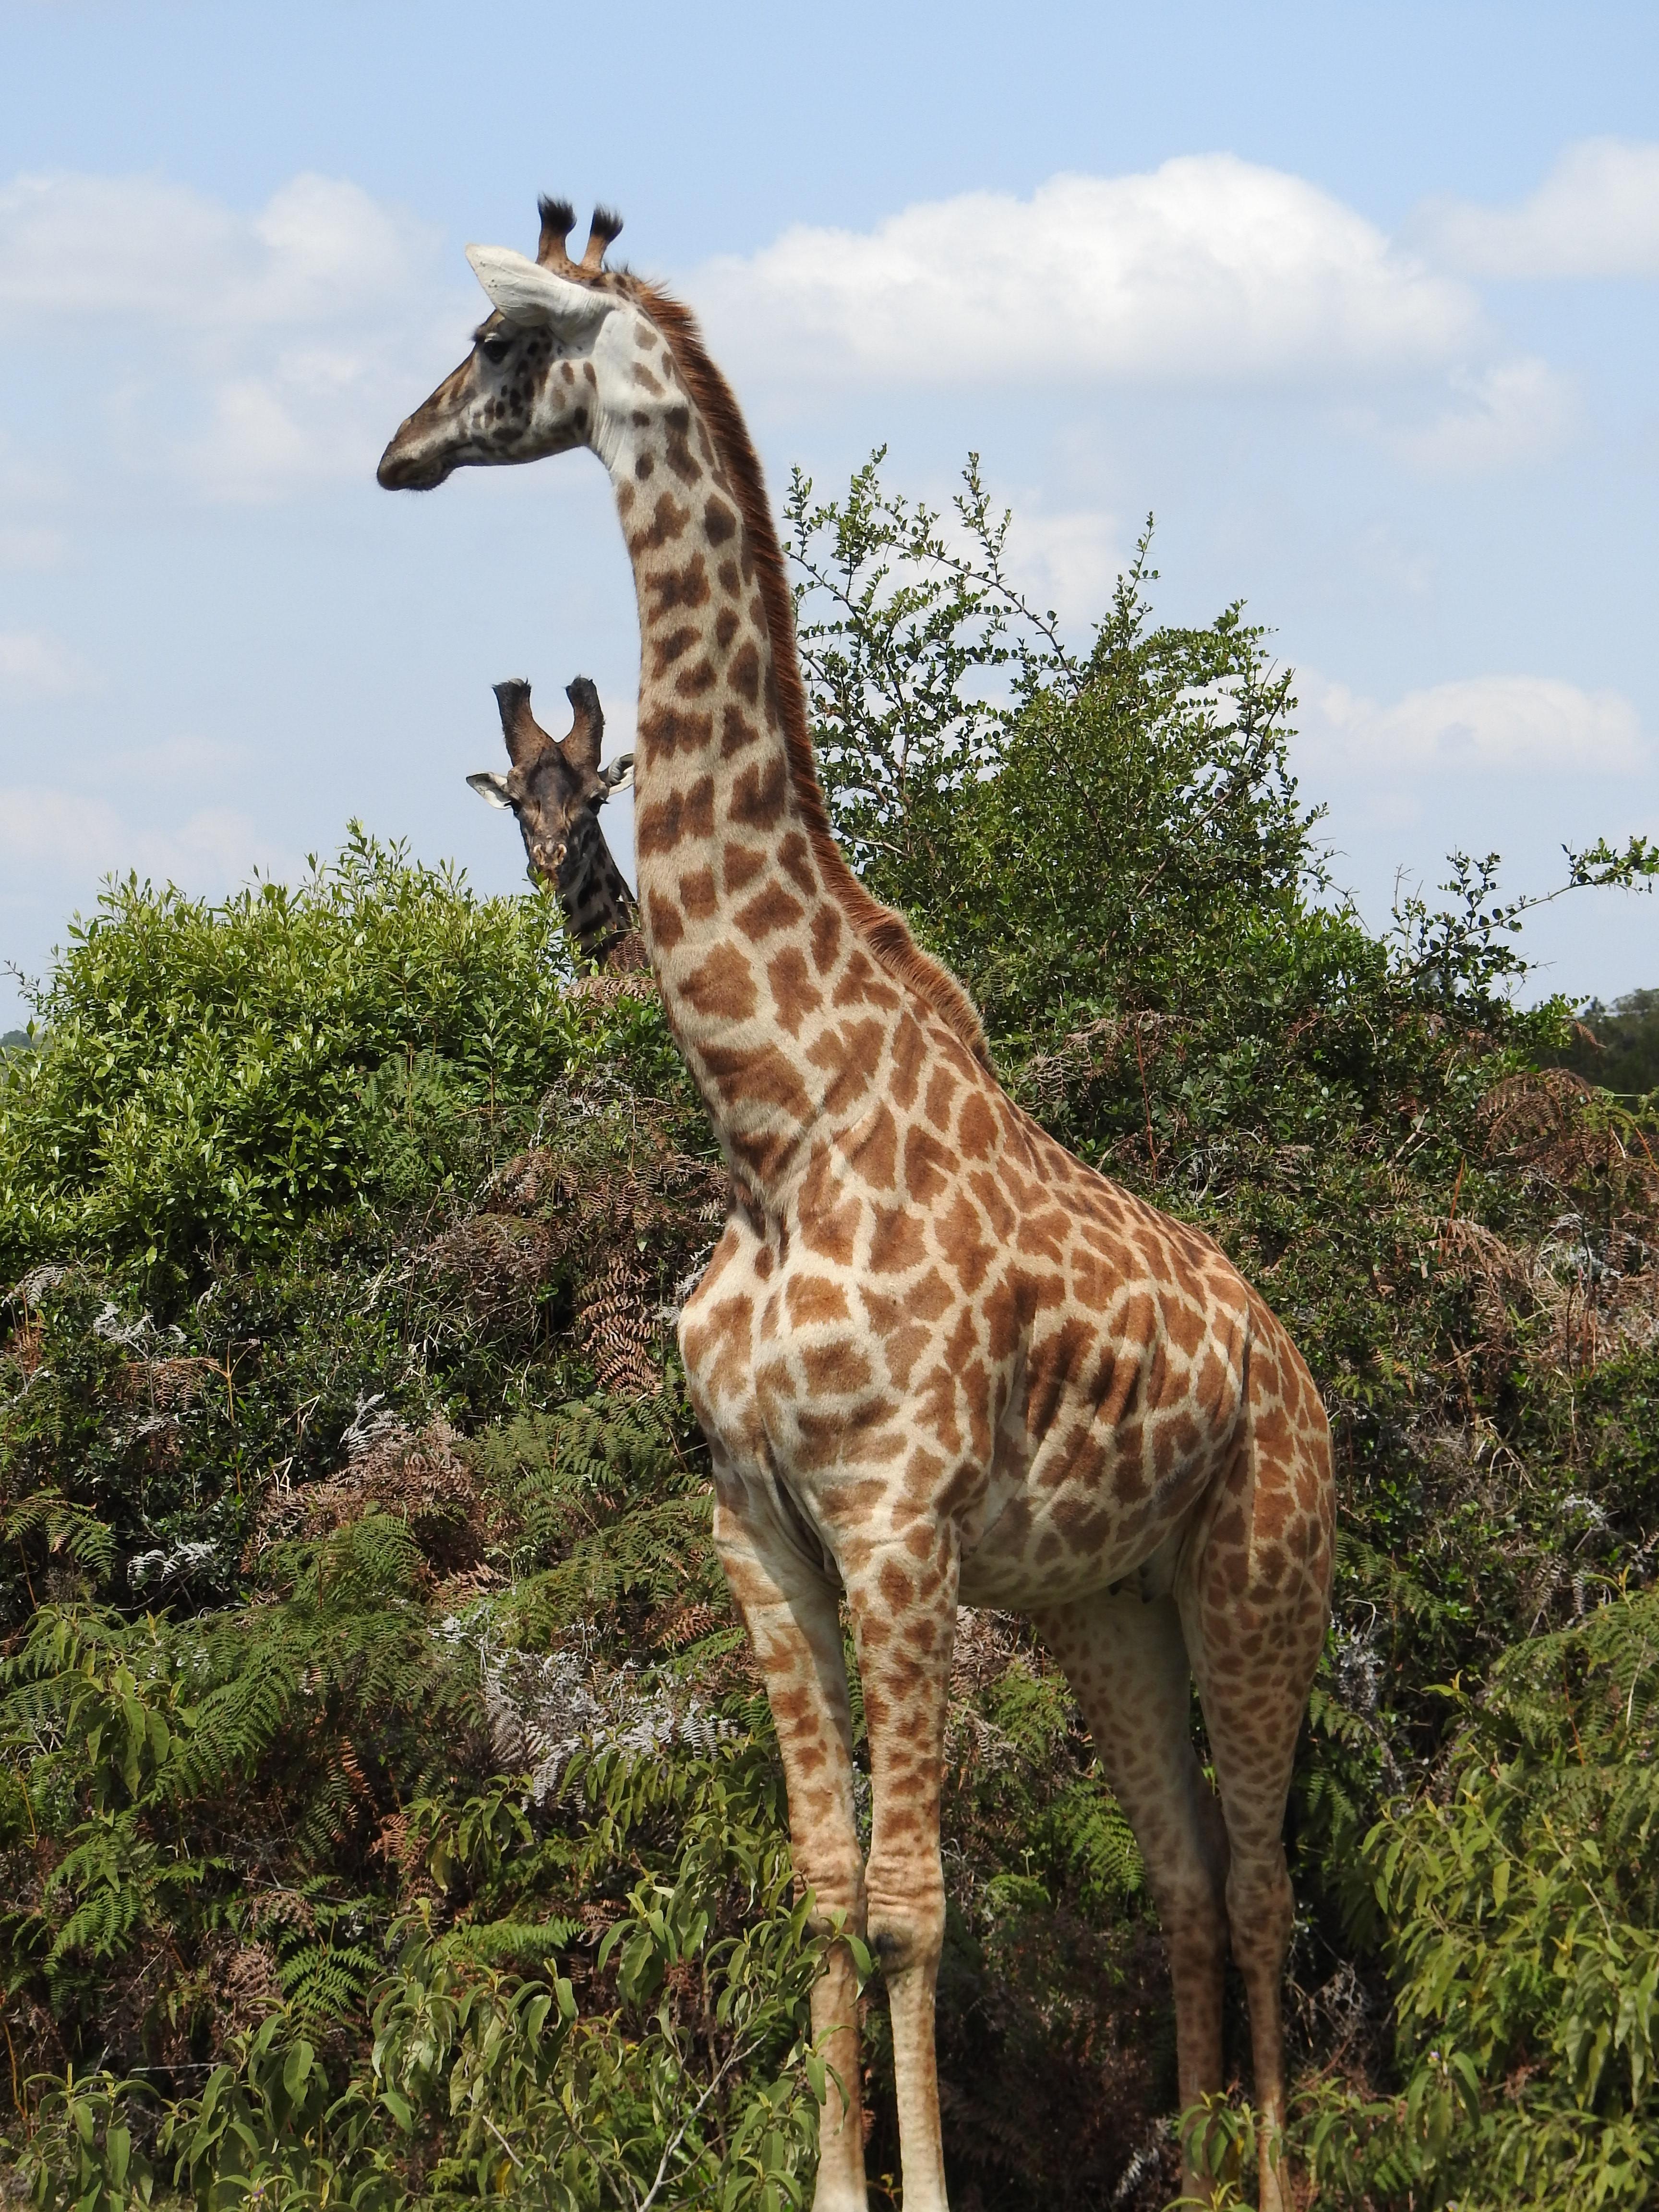 Giraffes_2JPG.jpg